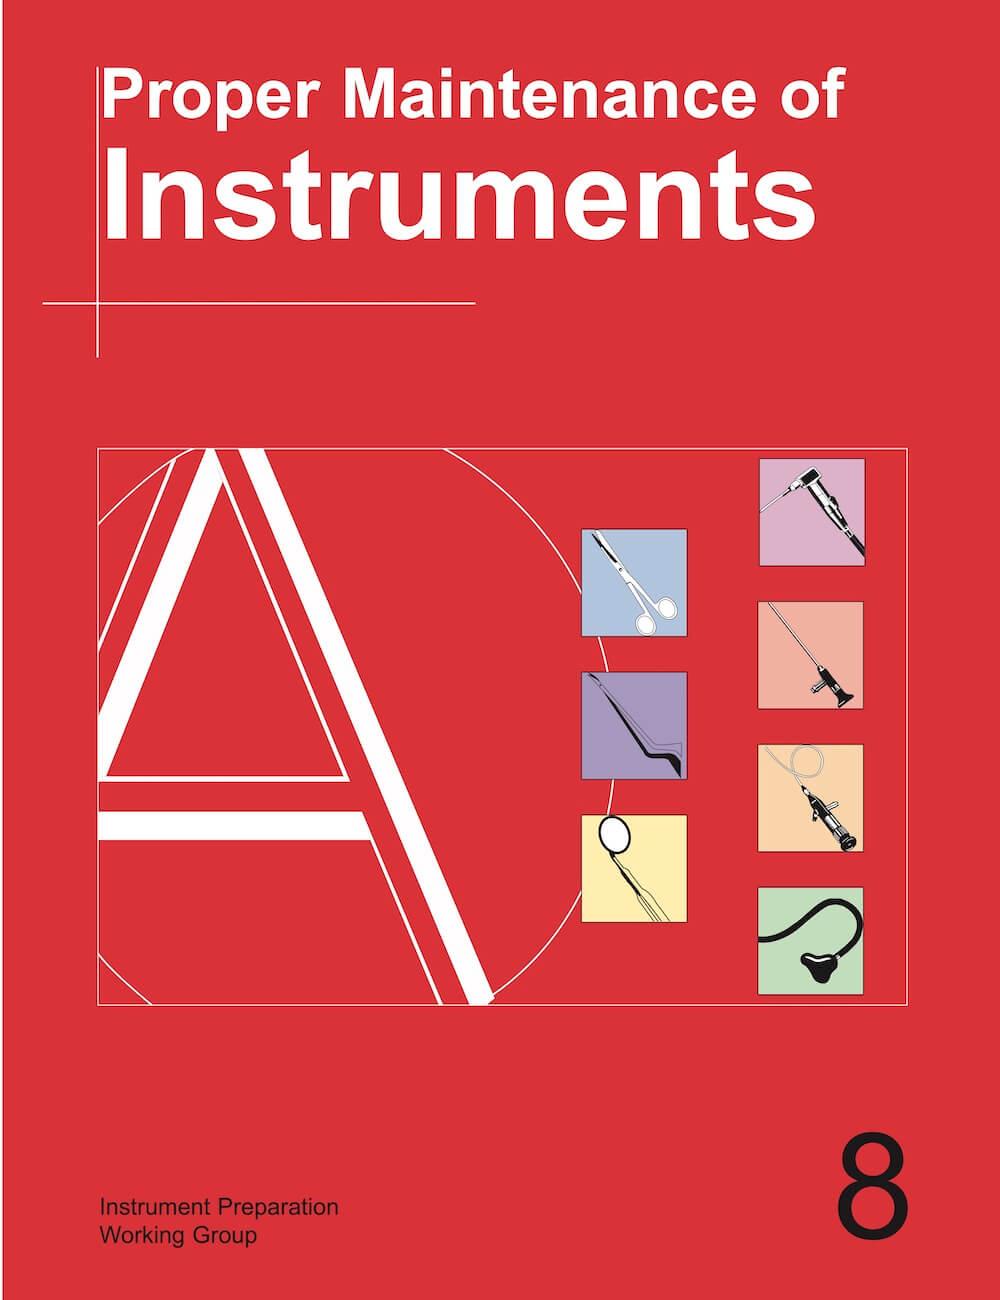 AKI_guide-proper-maintenance-of-instruments